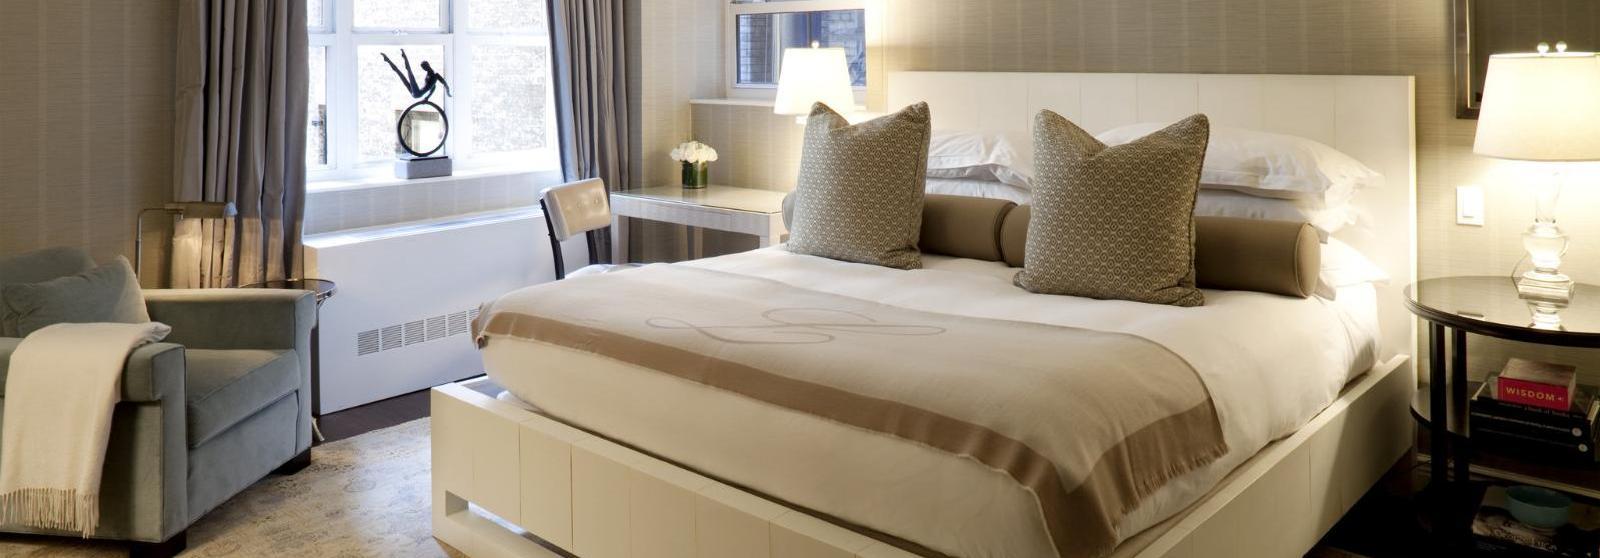 乐威尔酒店(The Lowell) 图片  www.lhw.cn